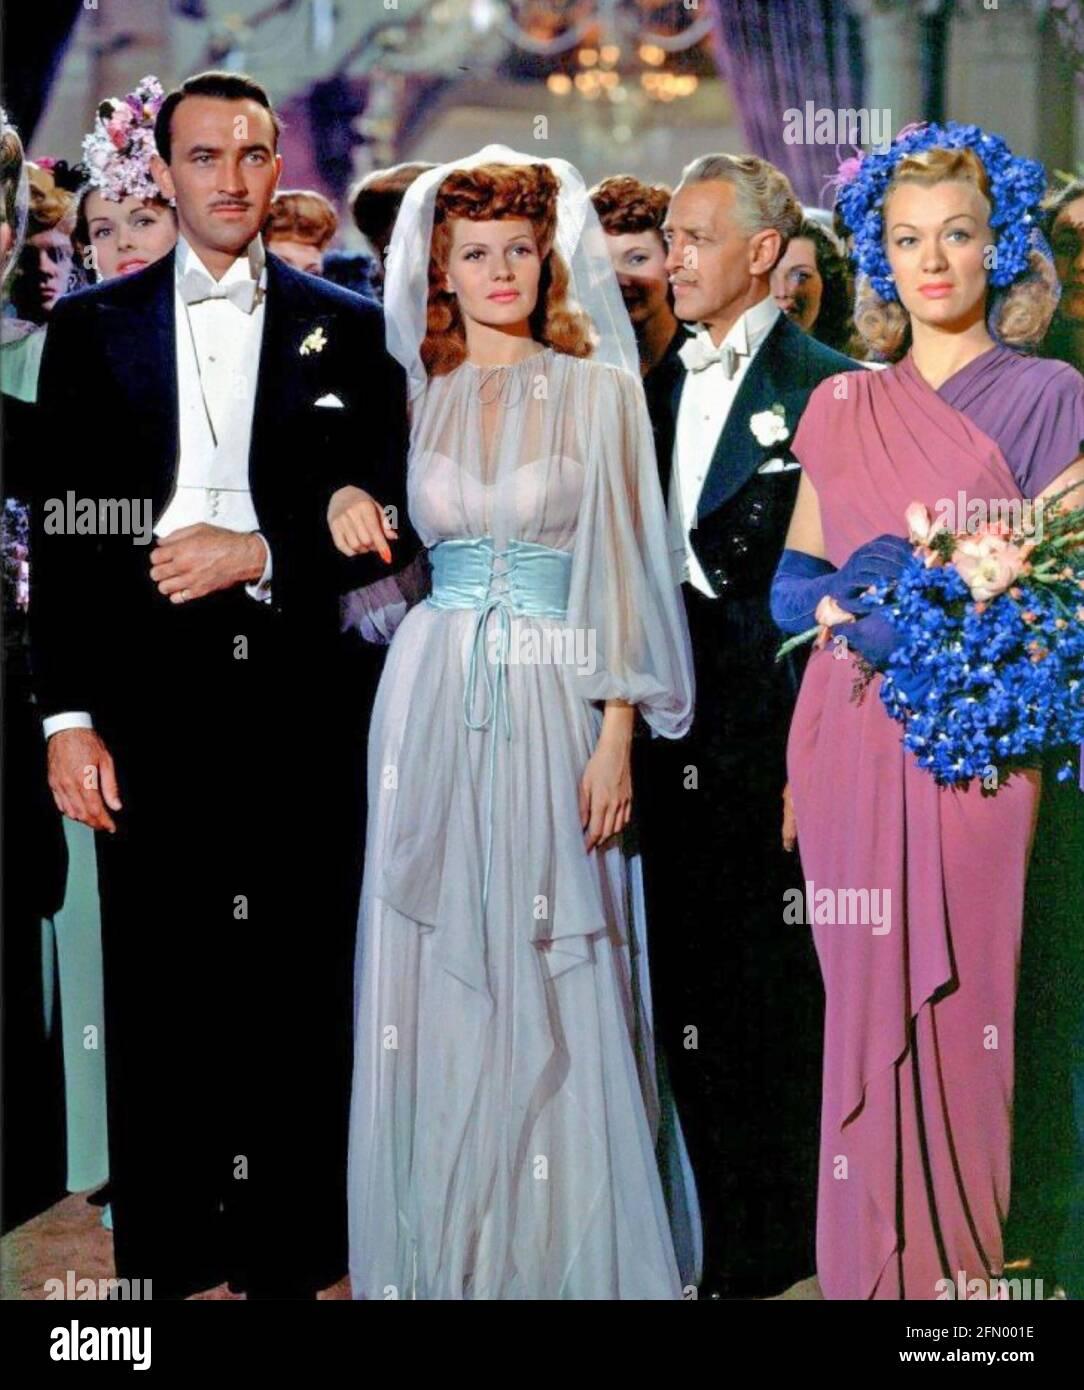 COVER GIRL 1944 Columbia Pictures film avec de gauche: Lee Bowman, Rita Hayworth, Otto Kruger, Eve Arden. Banque D'Images